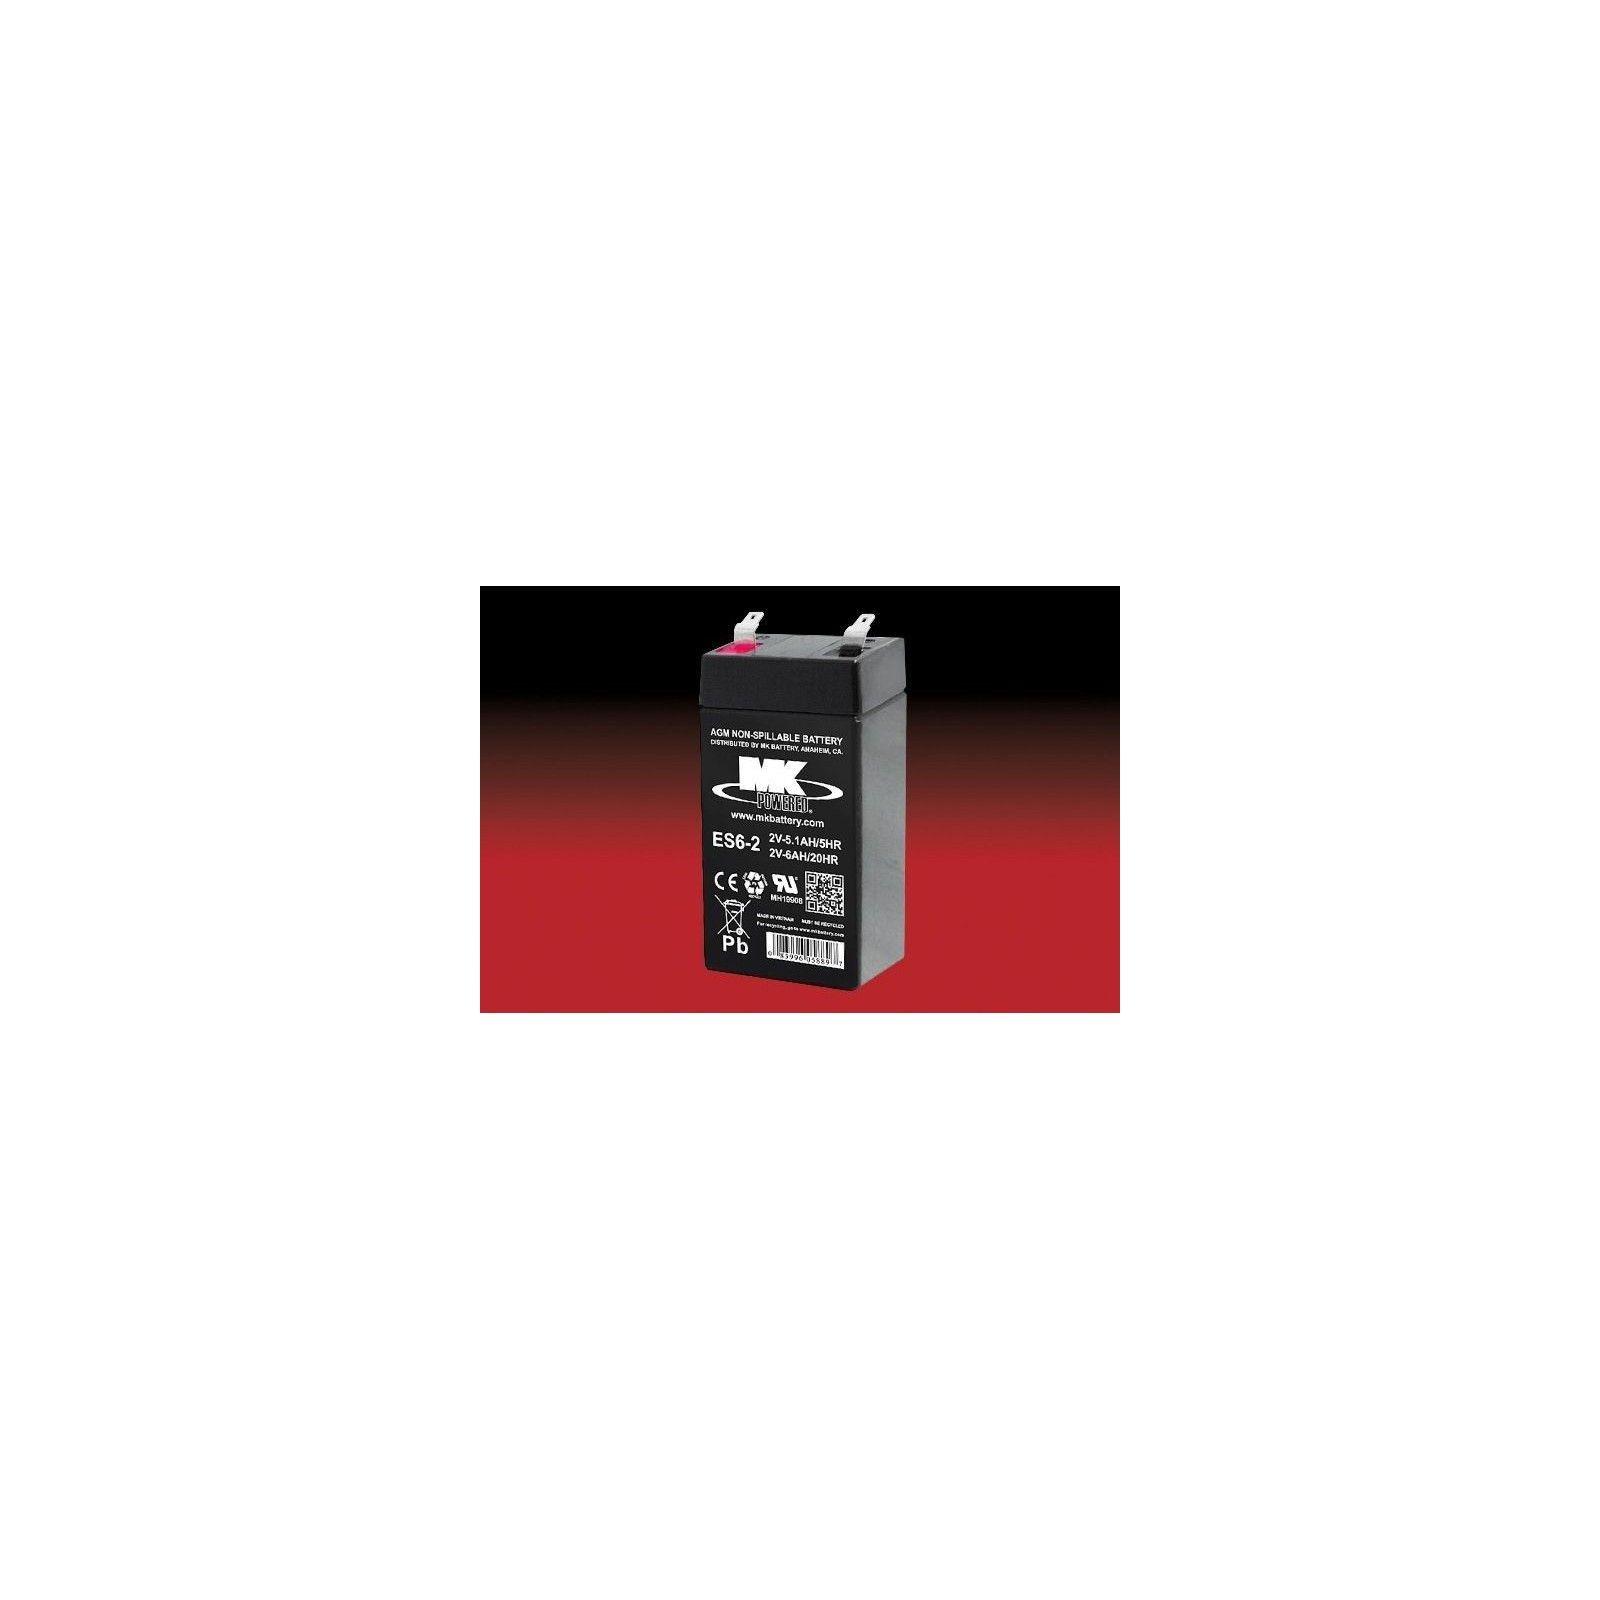 Batería MK ES6-2 6Ah 2V Agm MK - 1